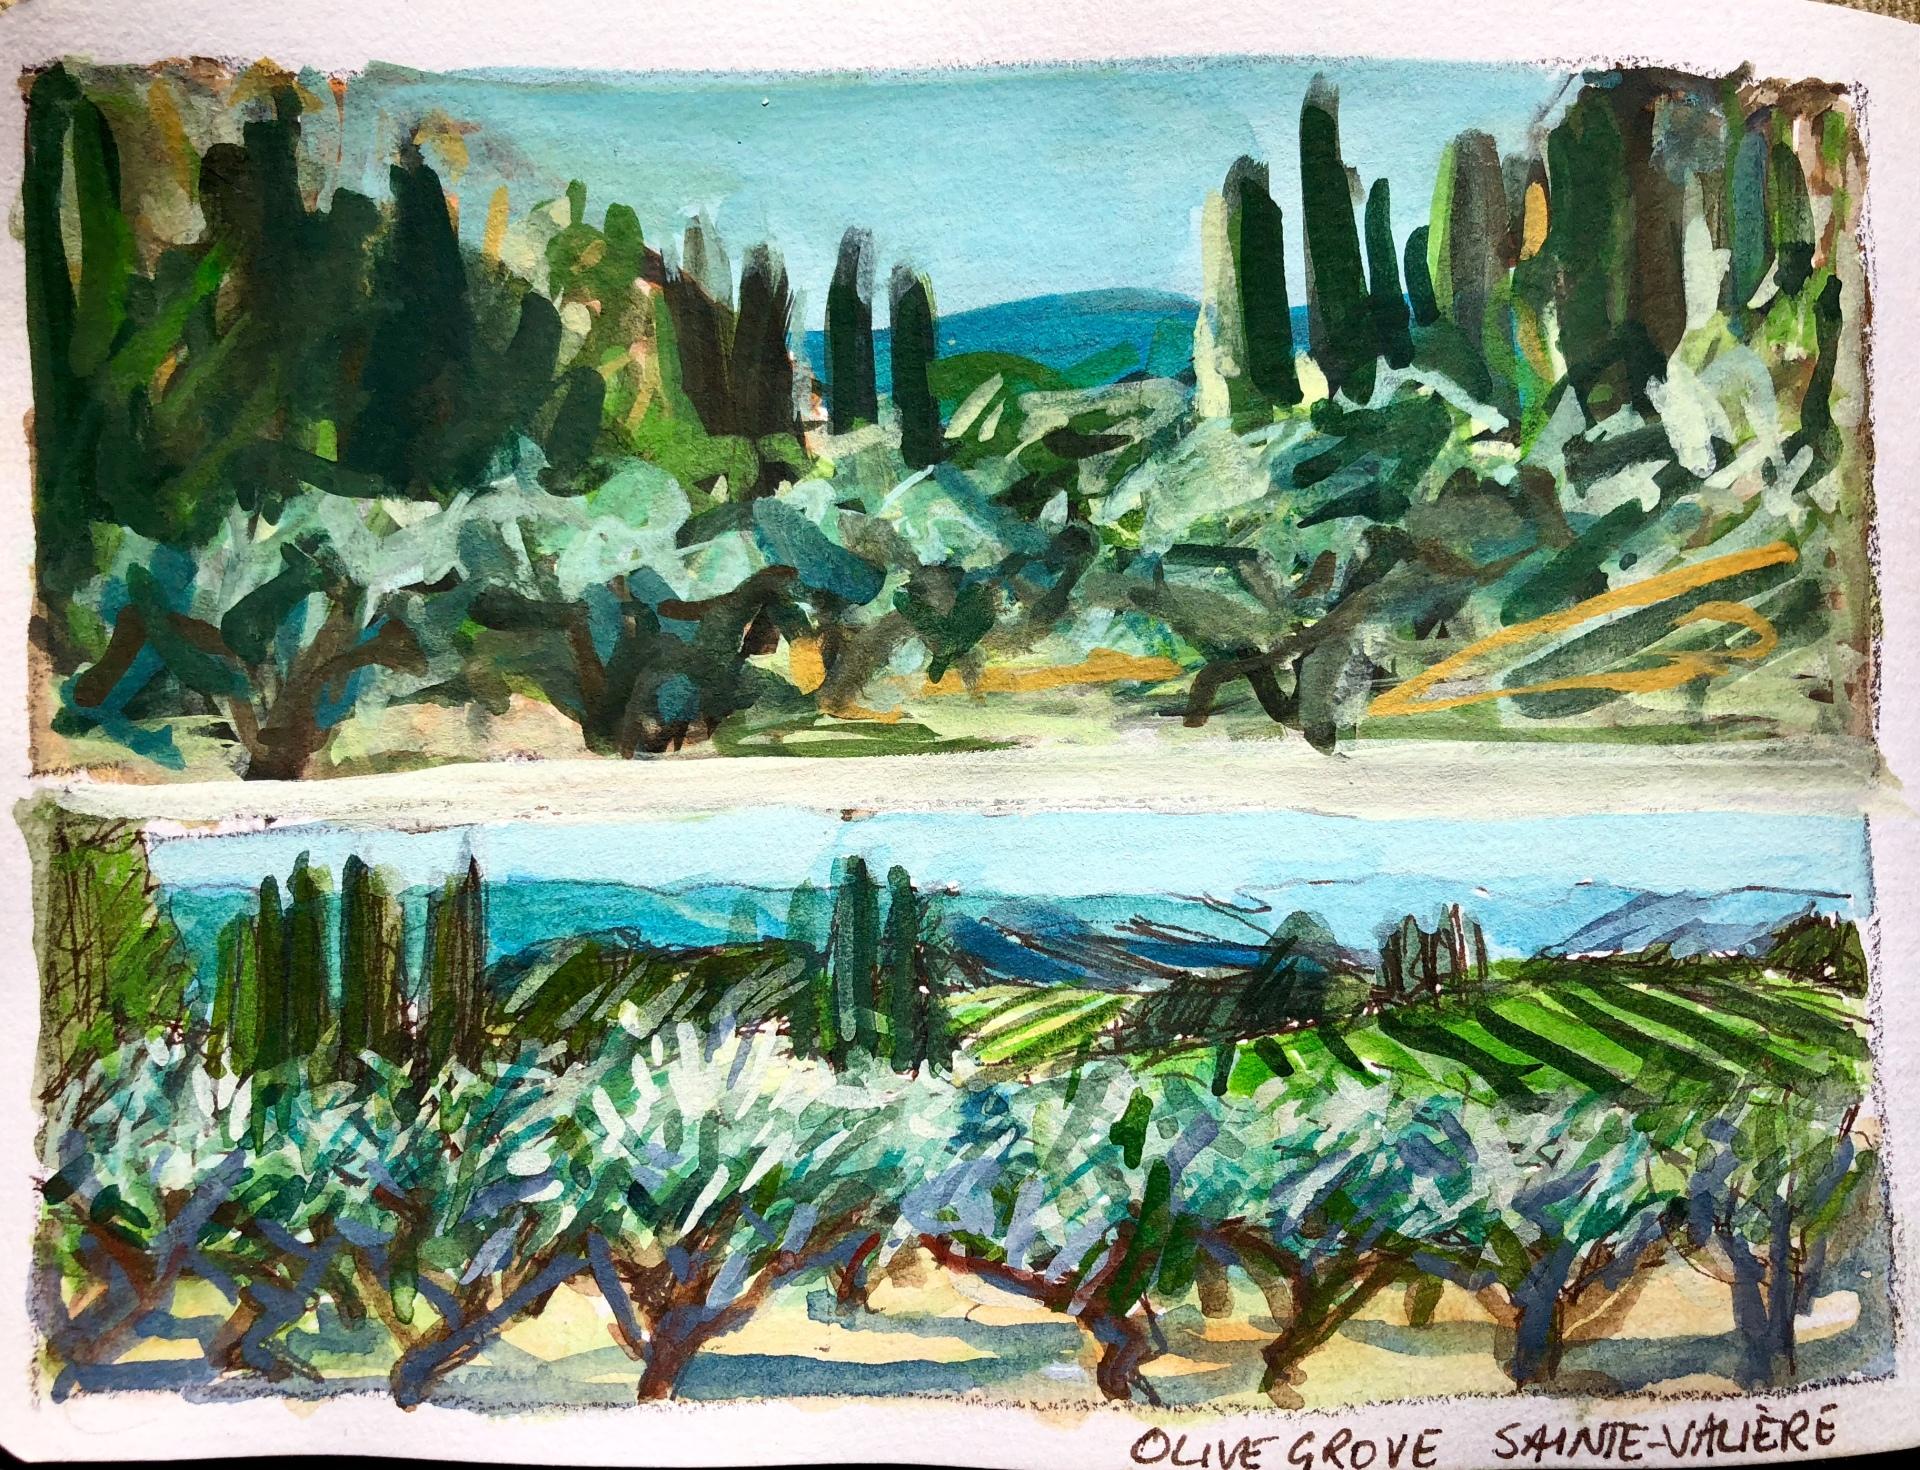 Olive Grove Sainte-Valière